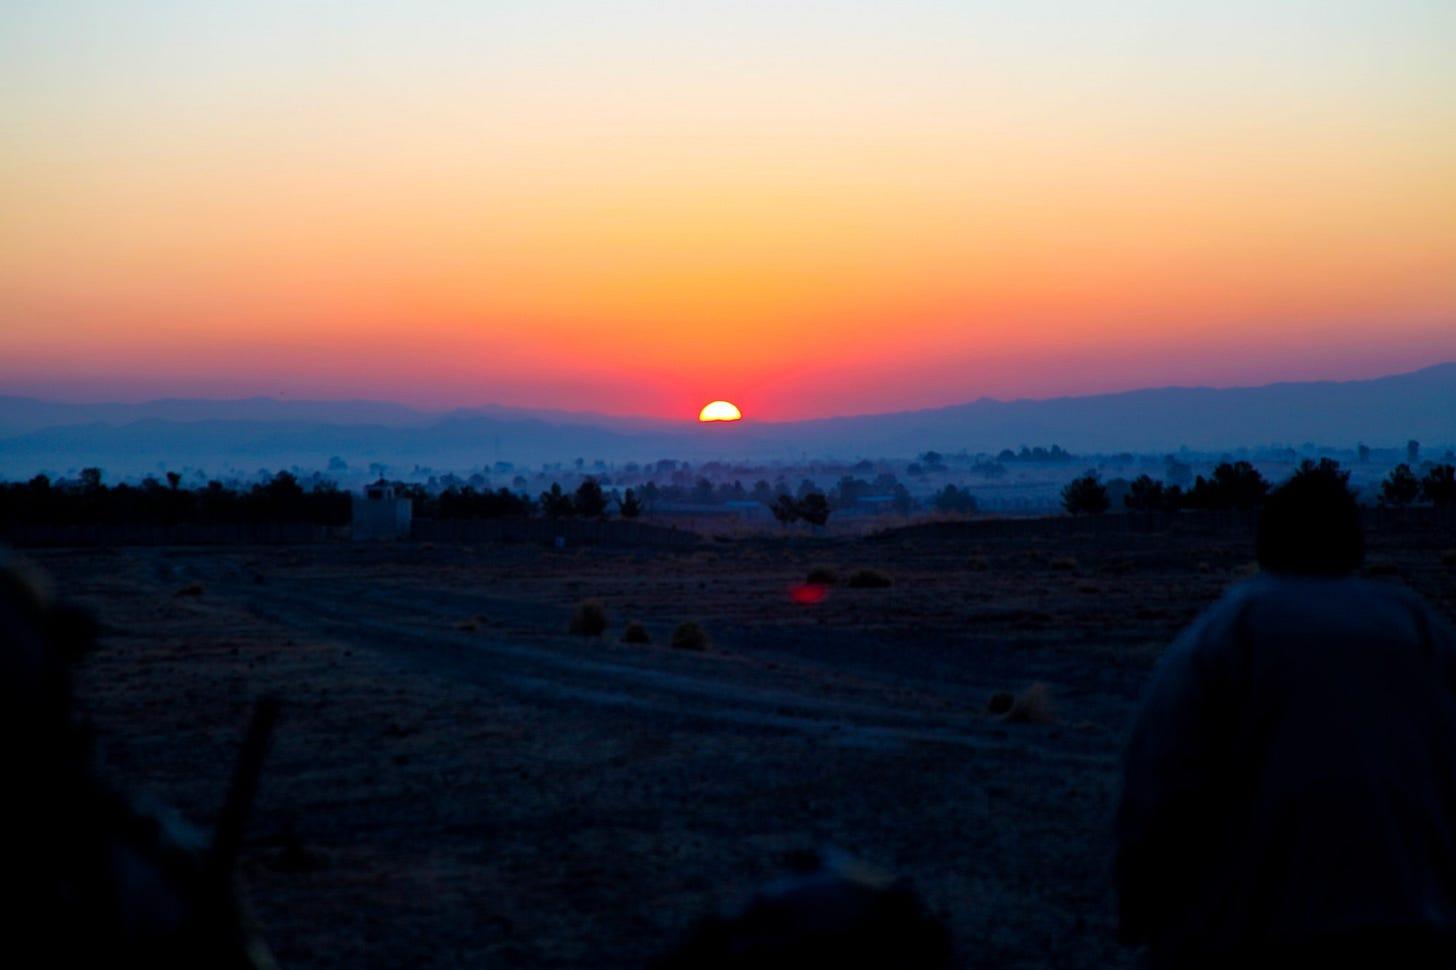 Sunrise, Khost, Afghanistan, in 2013. Codie M. Mendenhall  / US Army